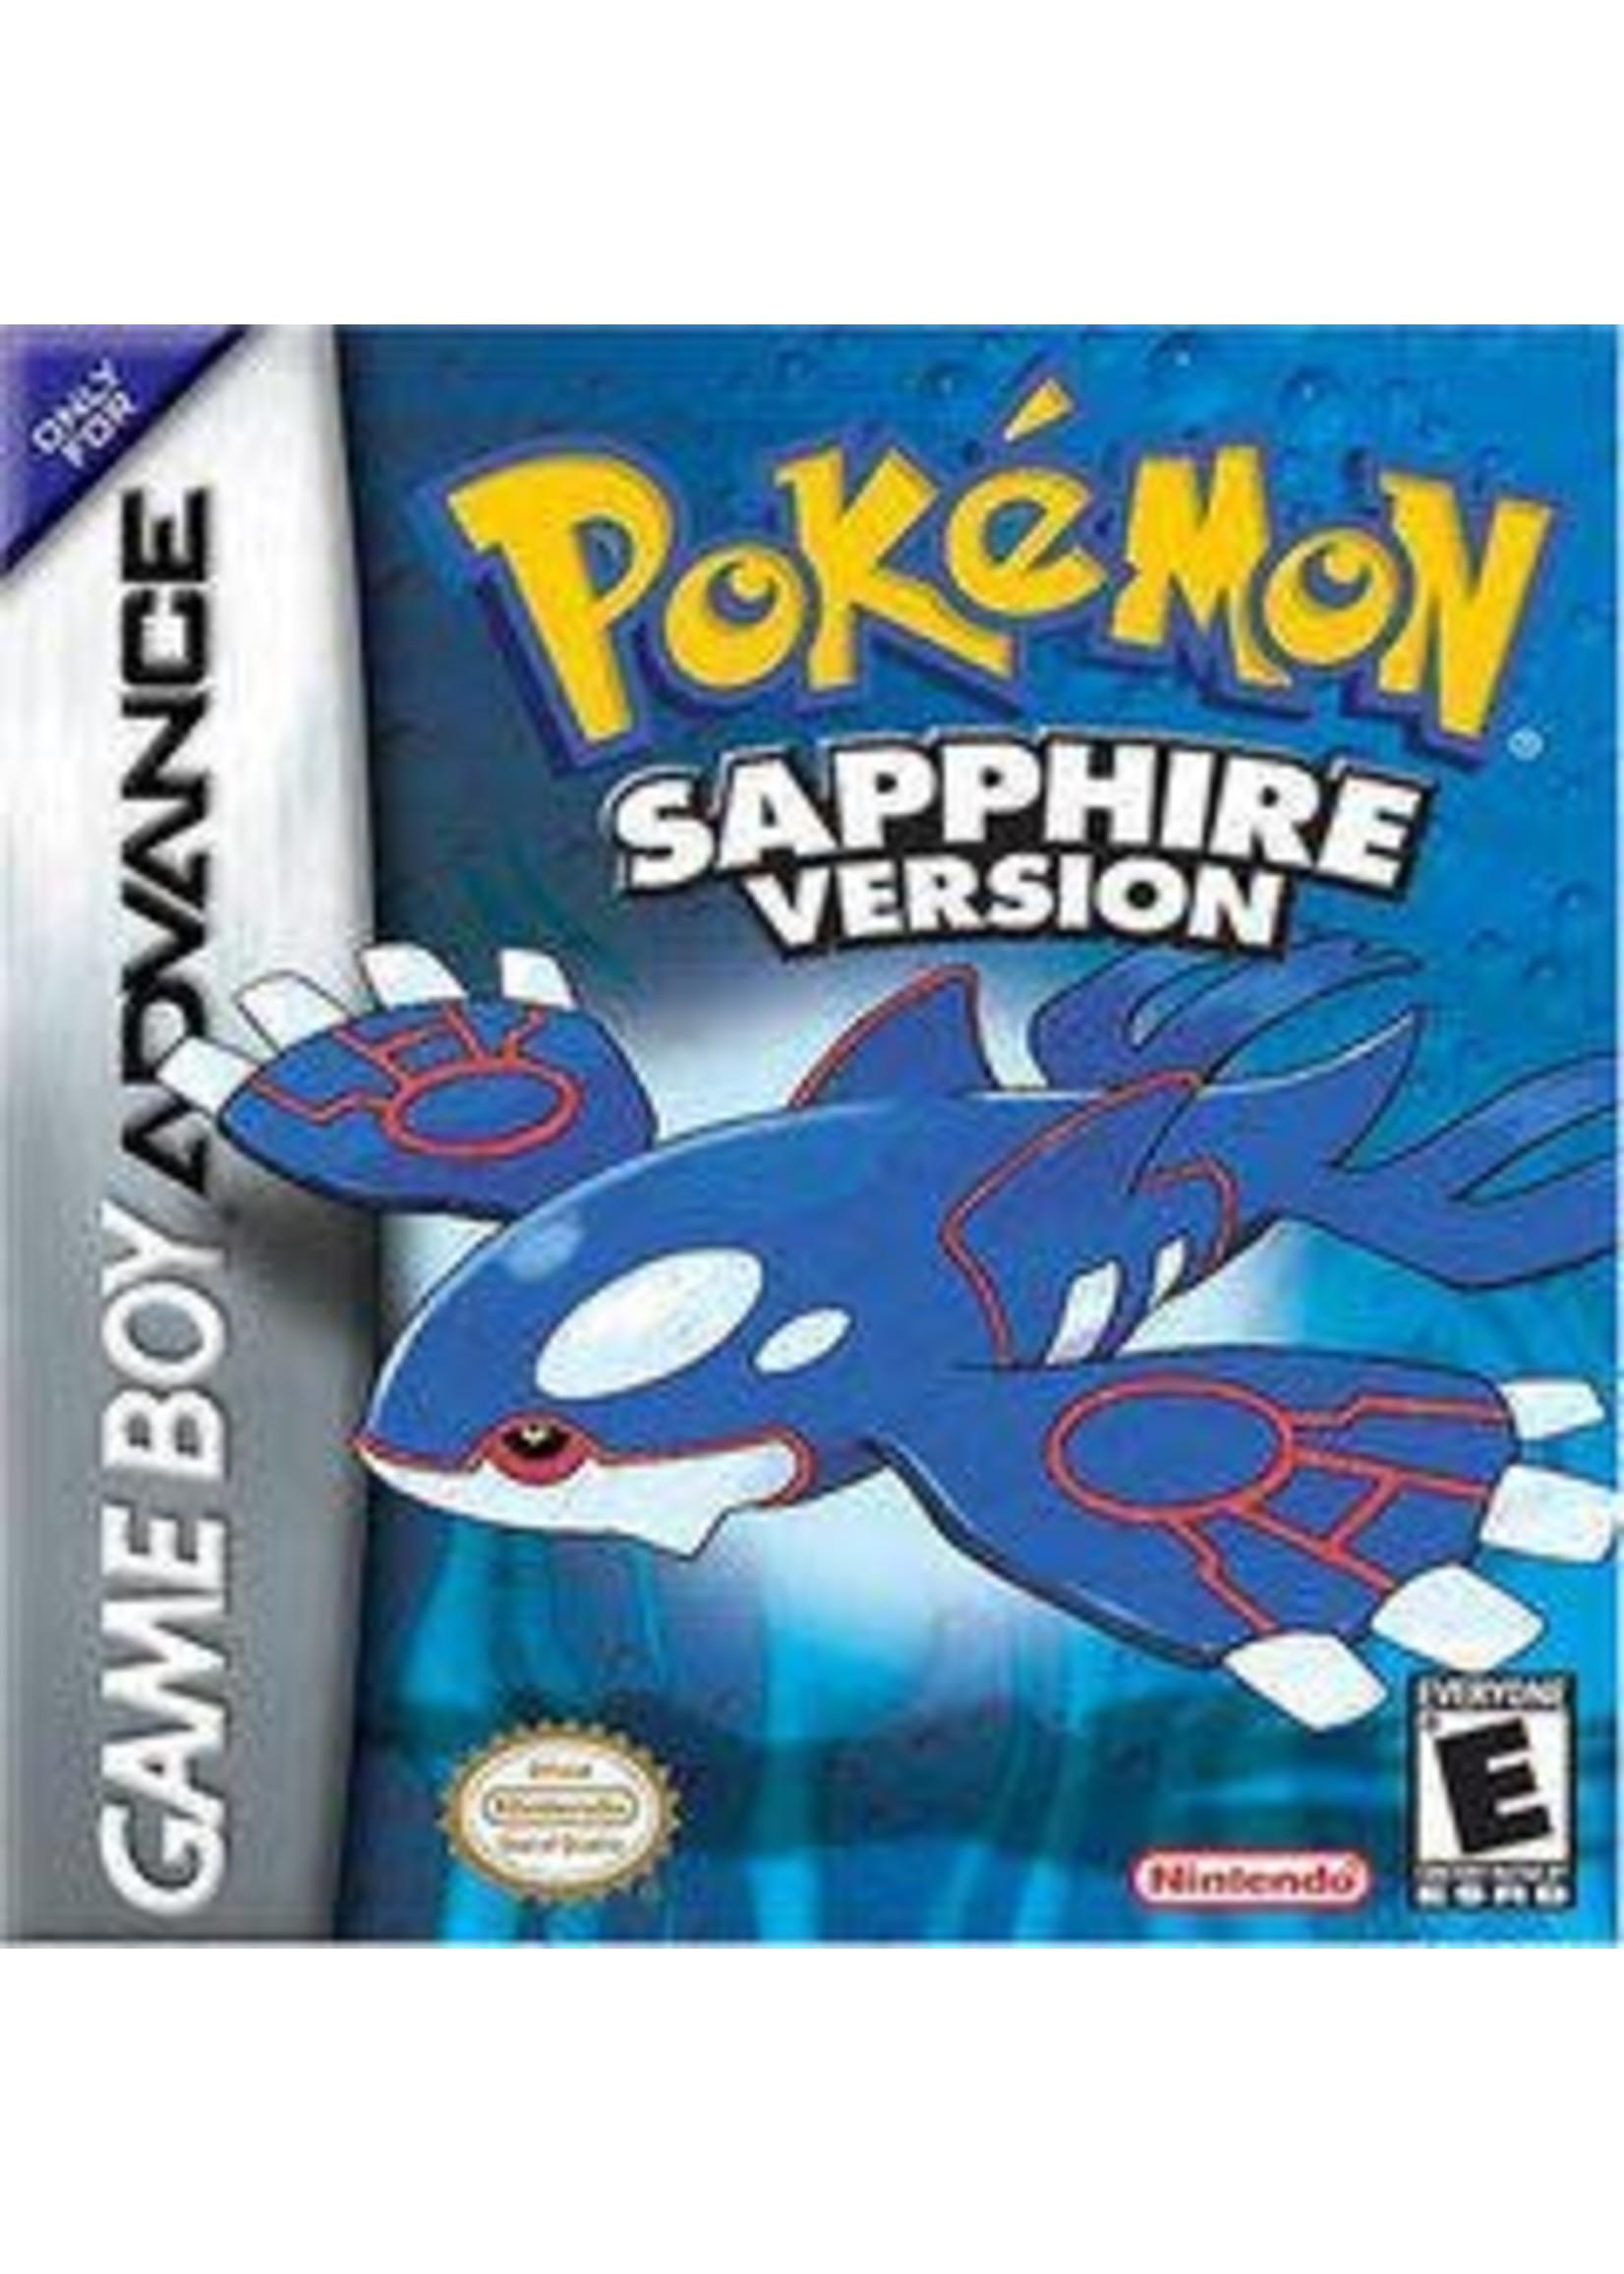 Pokemon Sapphire GameBoy Advance